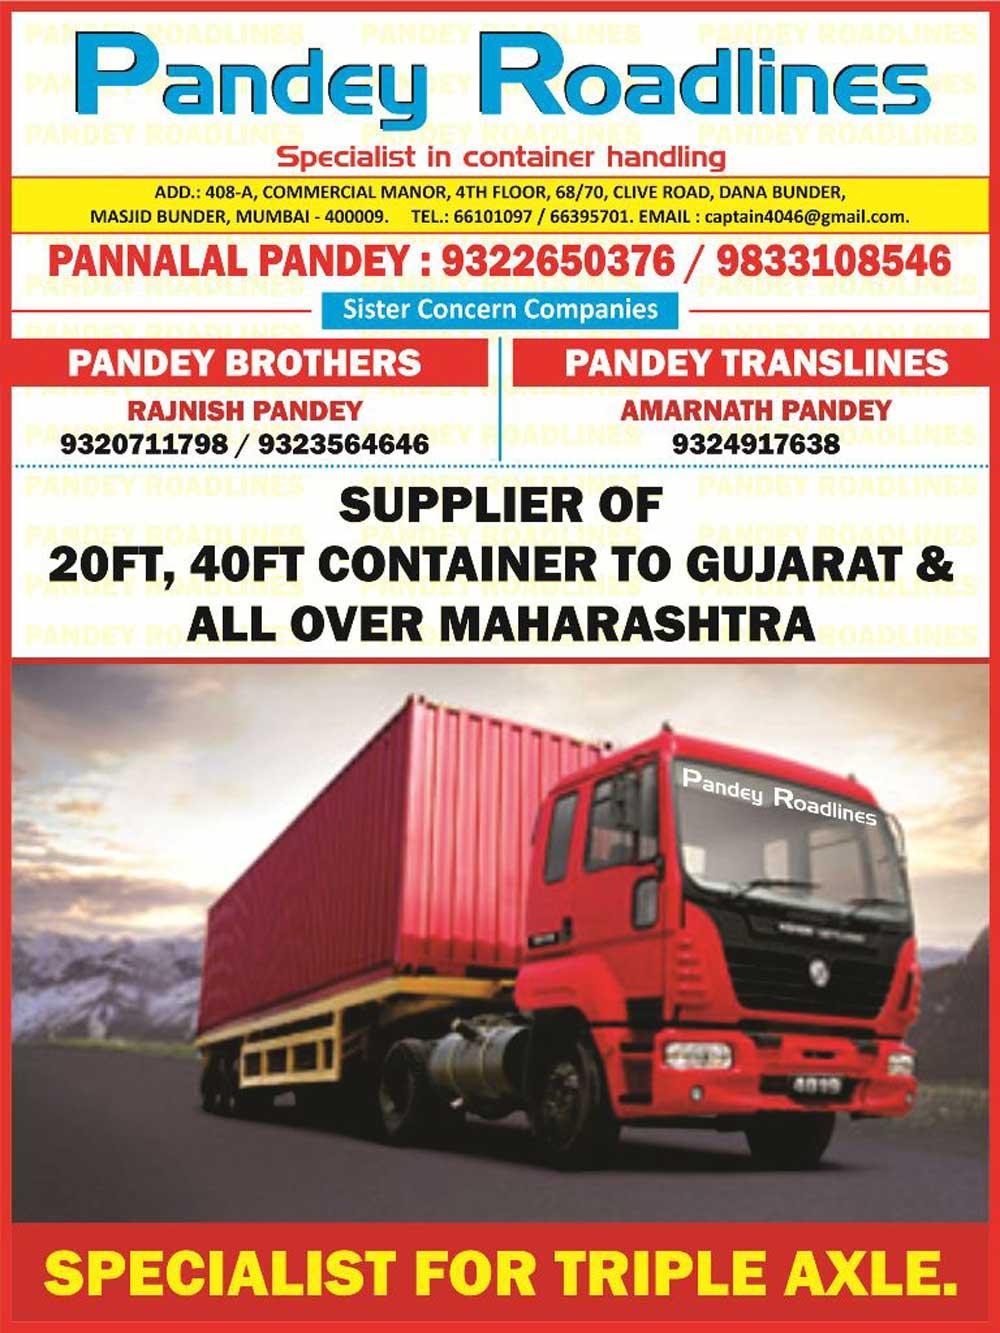 Pandey Roadlines